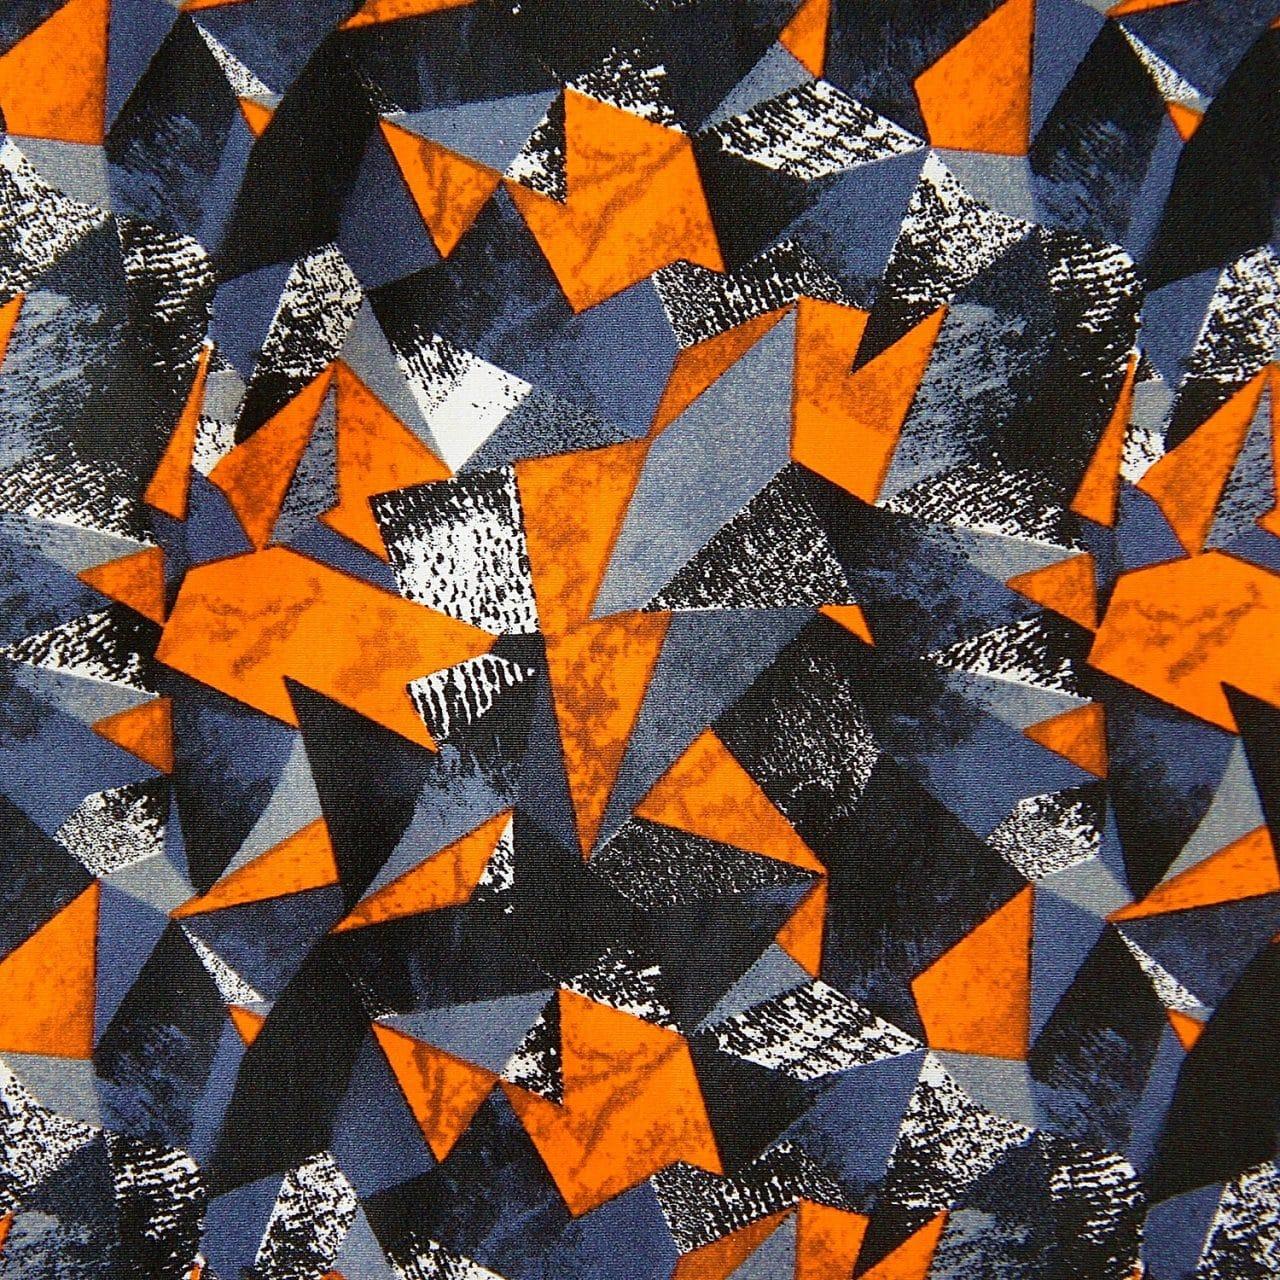 Puzzling – Orange